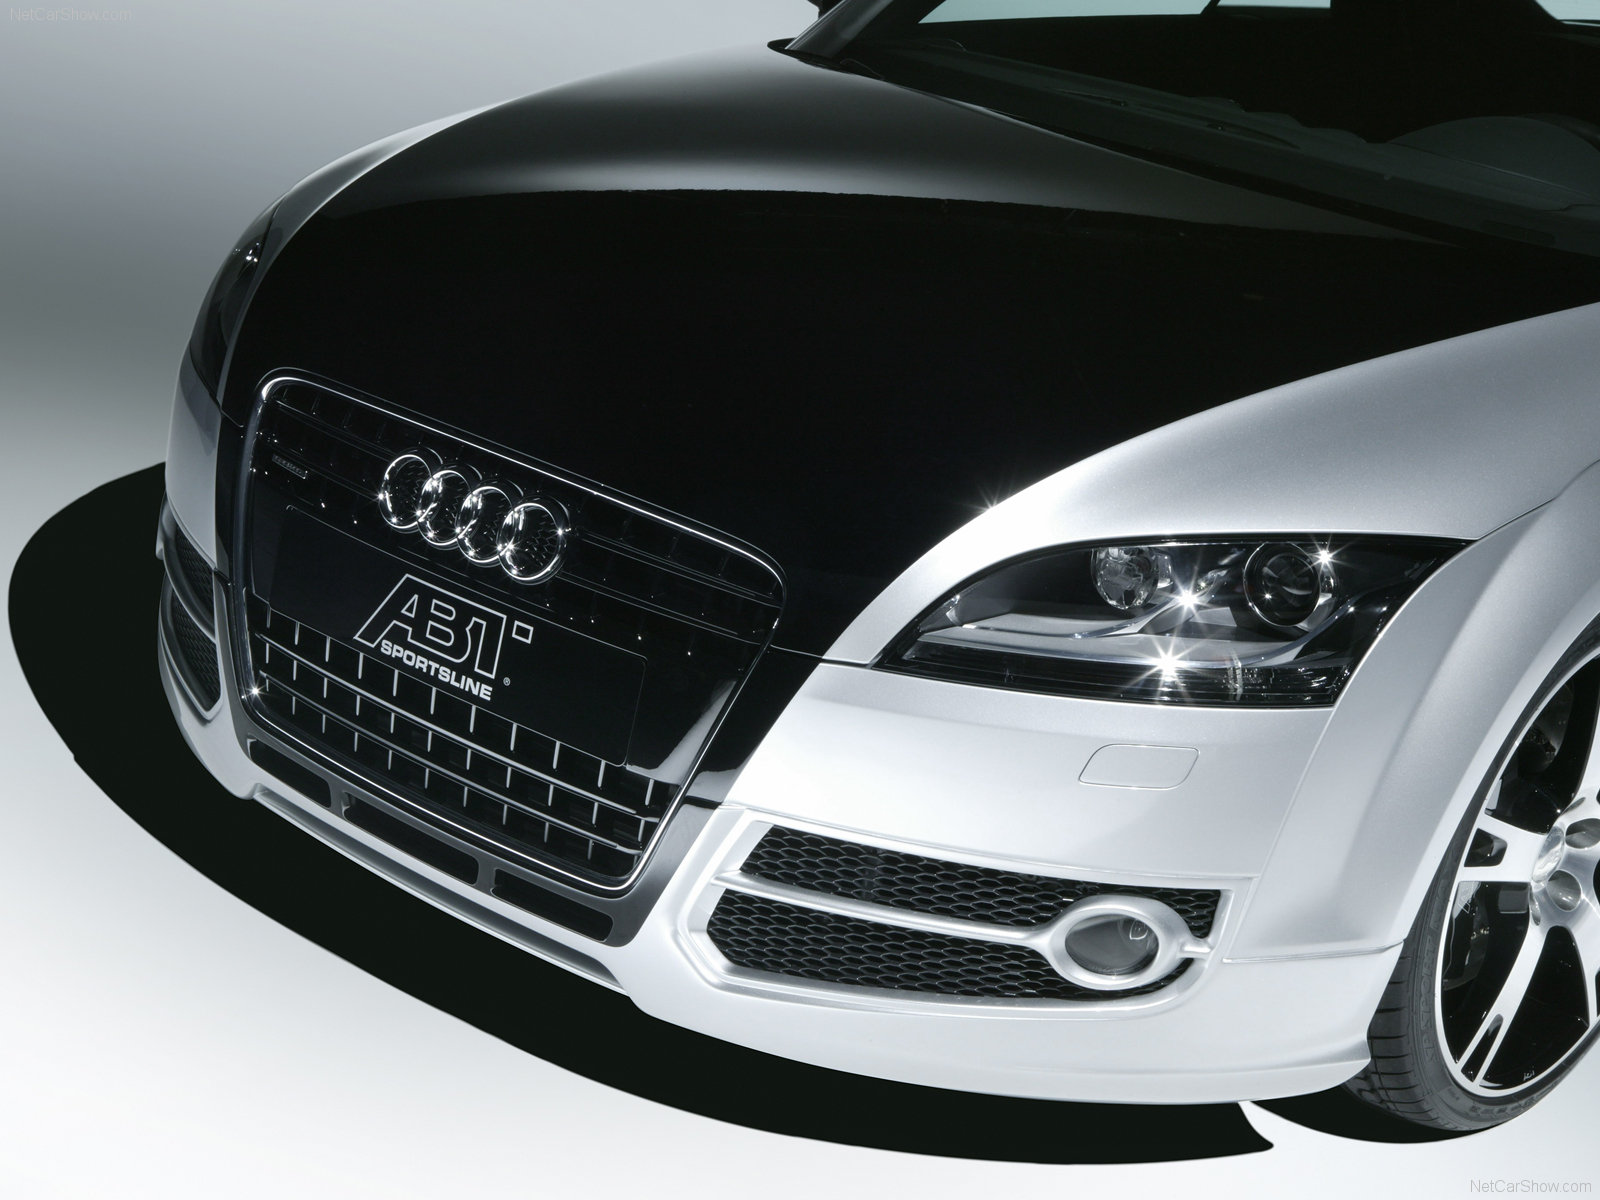 http://1.bp.blogspot.com/-gWIm4oTKmT8/T1Ilz0YkN6I/AAAAAAAAAbs/7yWtG_0DpQQ/s1600/ABT-Audi_TT-R_2007_1600x1200_wallpaper_08.jpg